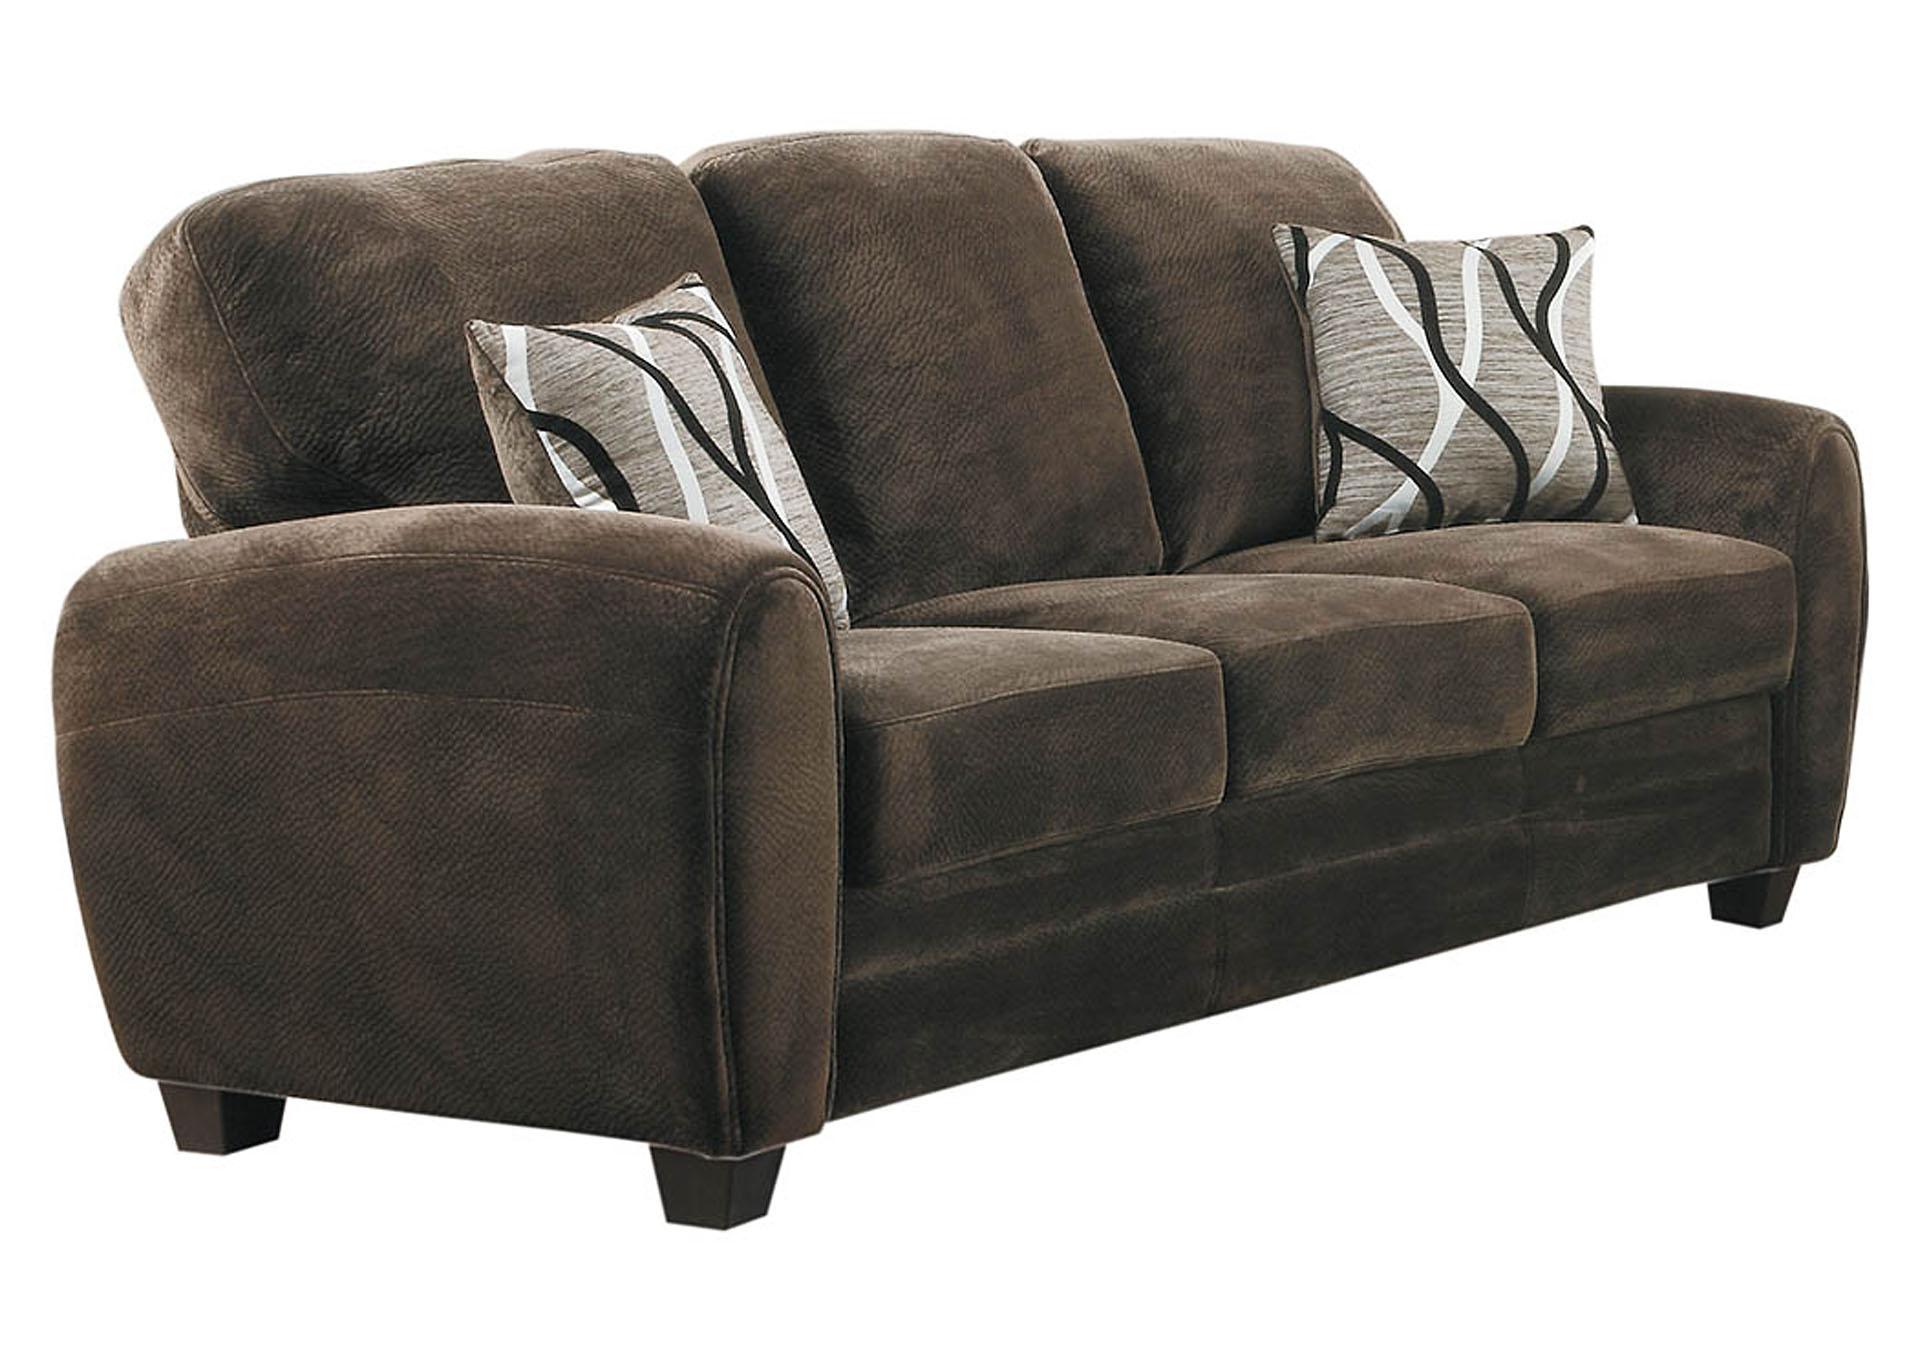 Merveilleux Rubin Chocolate Sofa,Homelegance